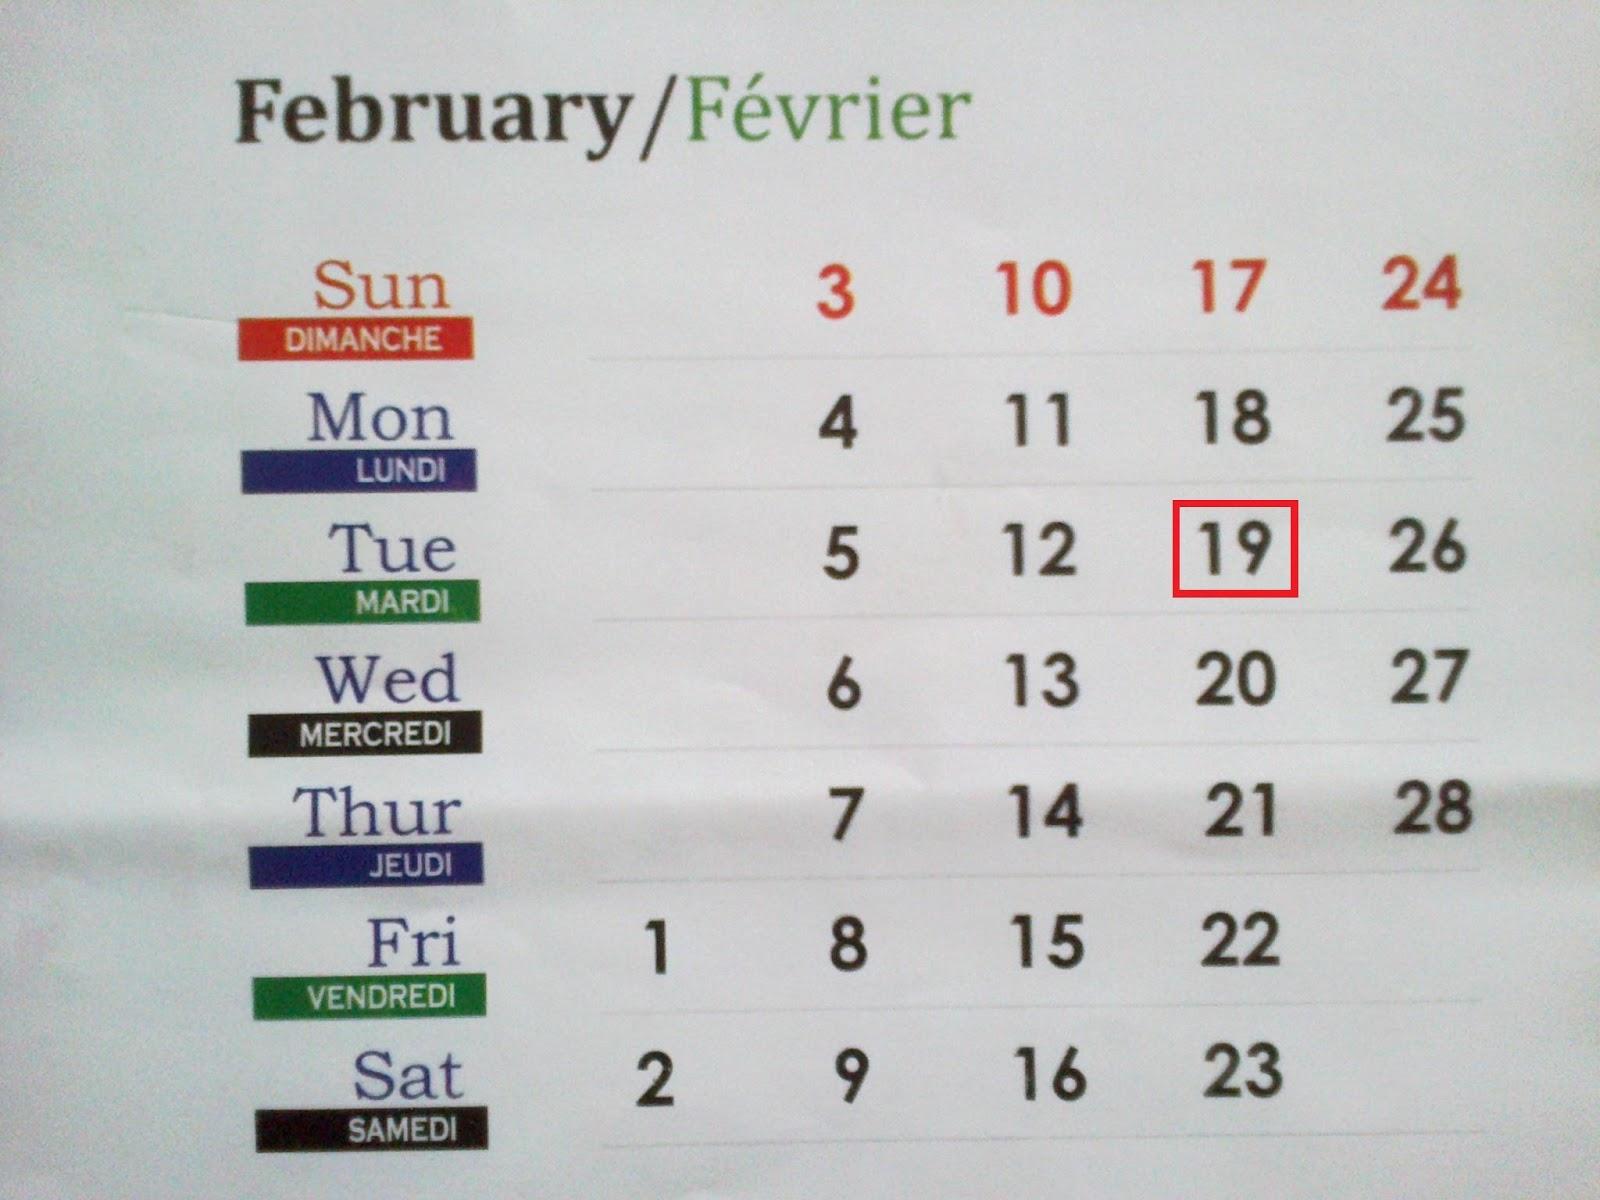 My Diary: Tuesday 19-02-2013